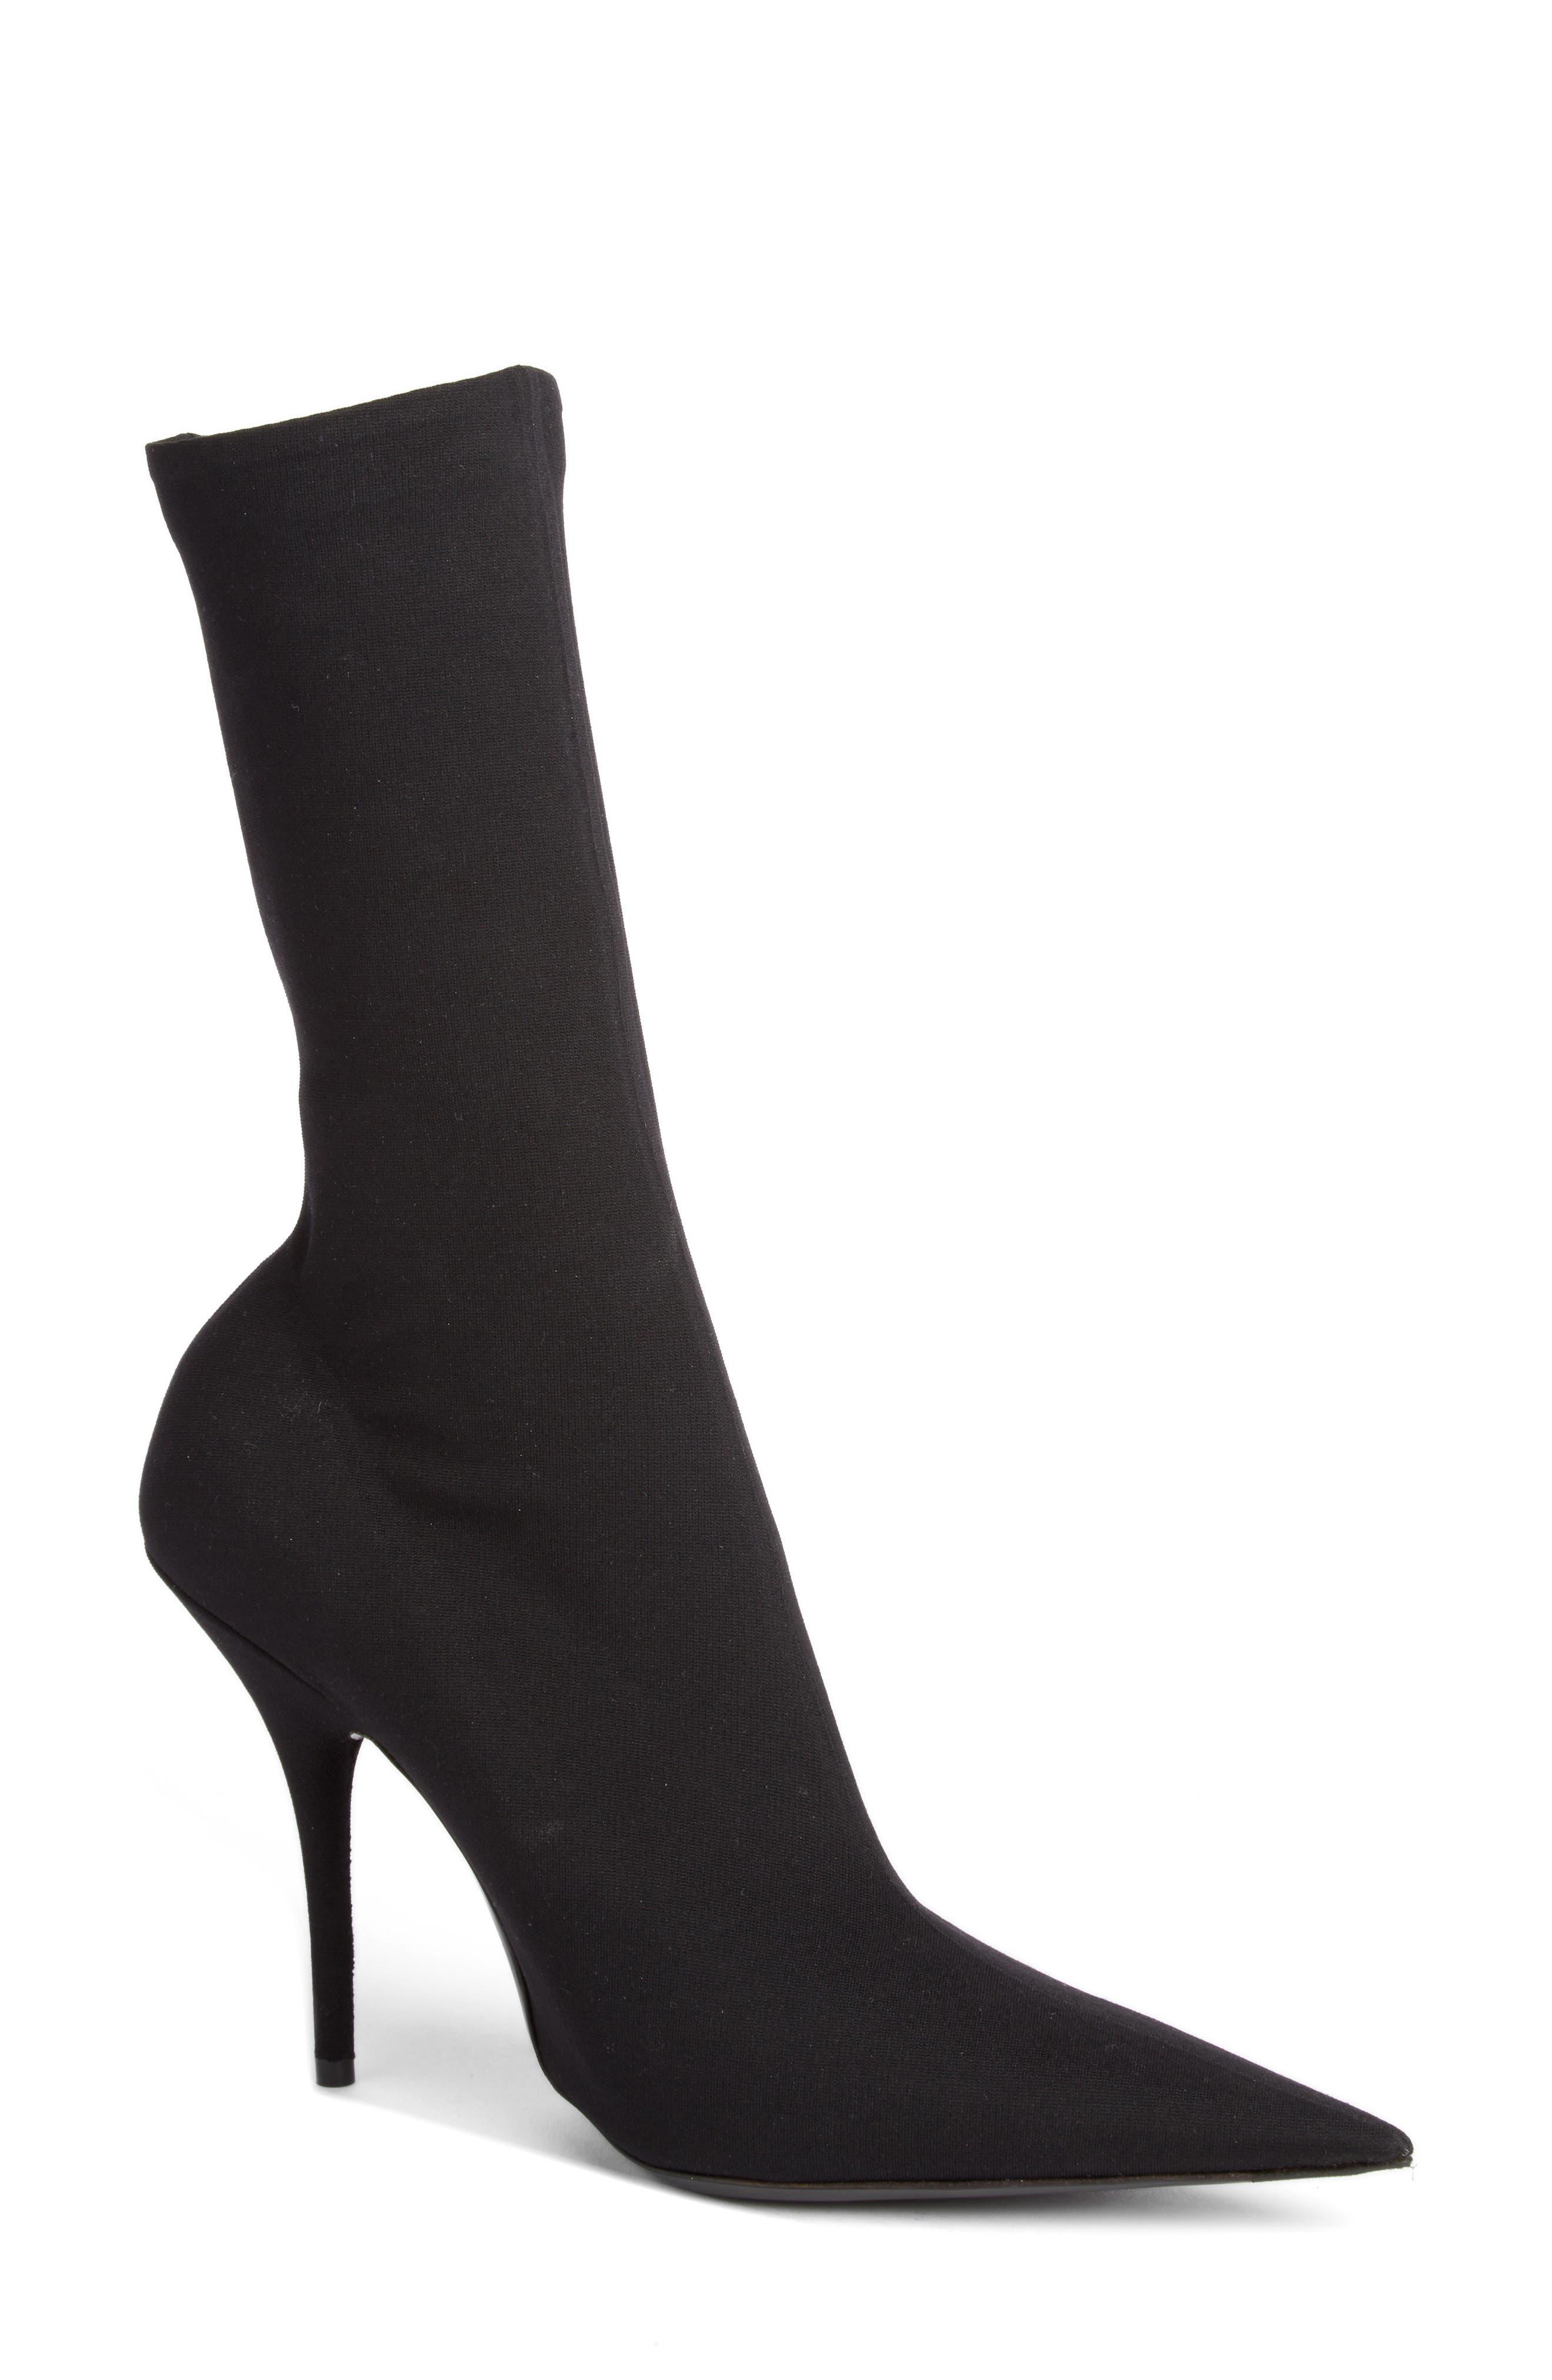 Balenciaga Pointy Toe Sock Bootie - Black